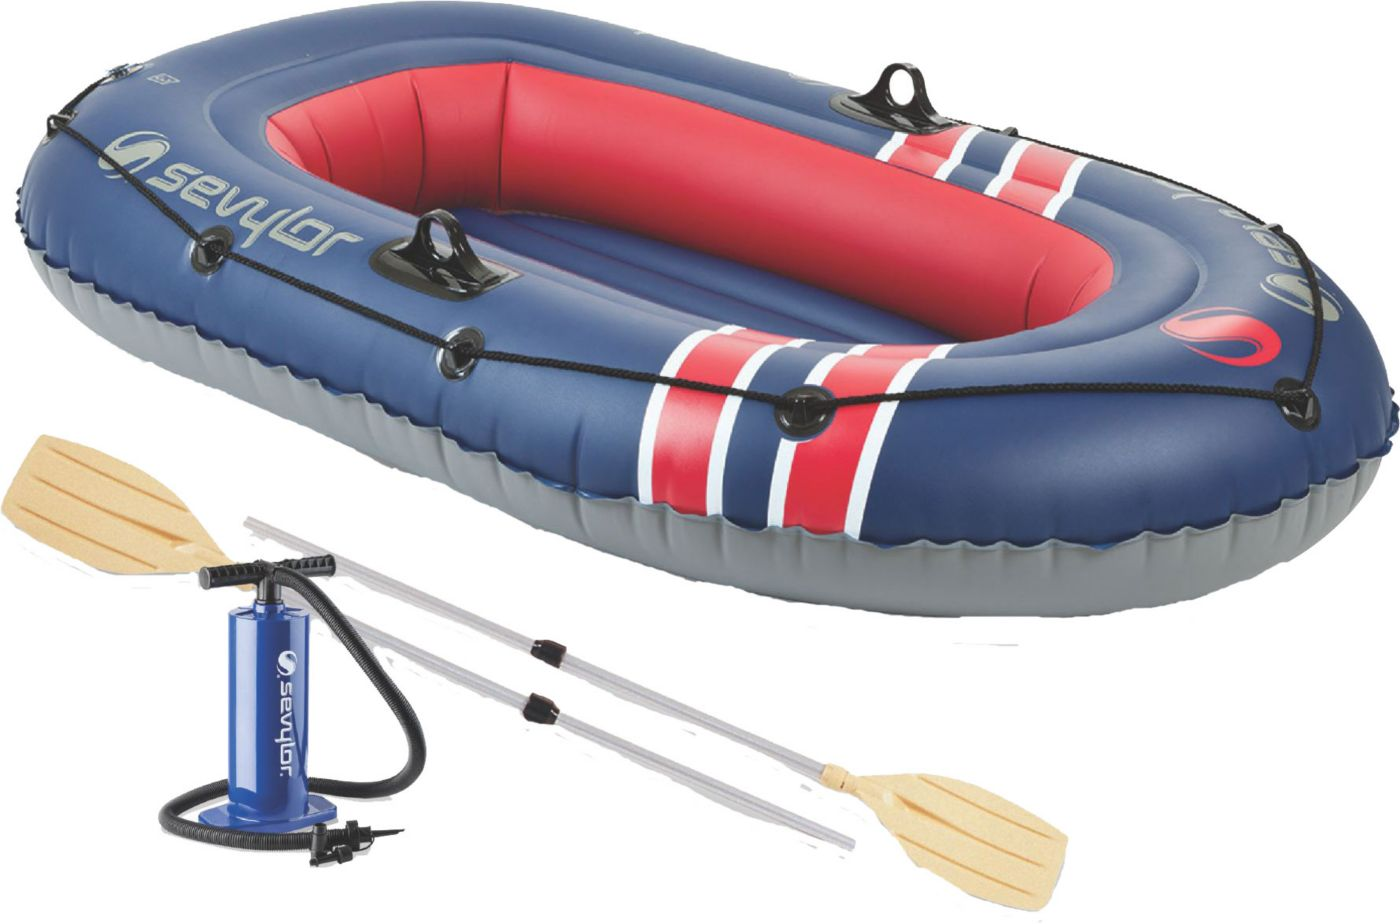 Sevylor Super Caravelle 200 Berkley Combo 2-Person Inflatable Boat